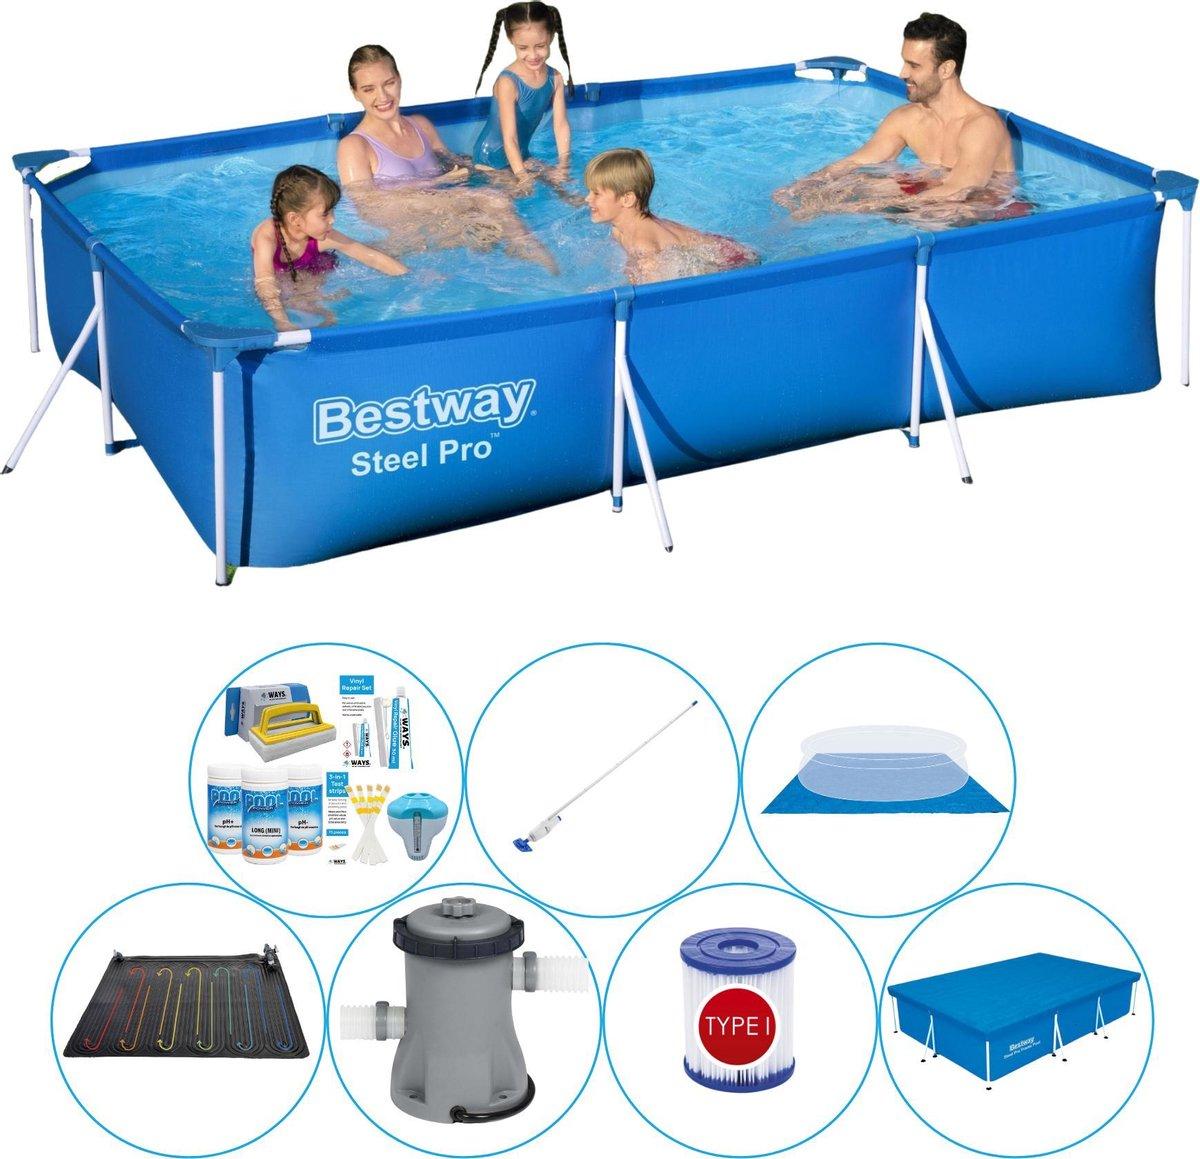 Bestway zwembad - 300 x 201 x 66 cm - afdekzeil - grondzeil - pomp - onderhoudsset - chloorpakket